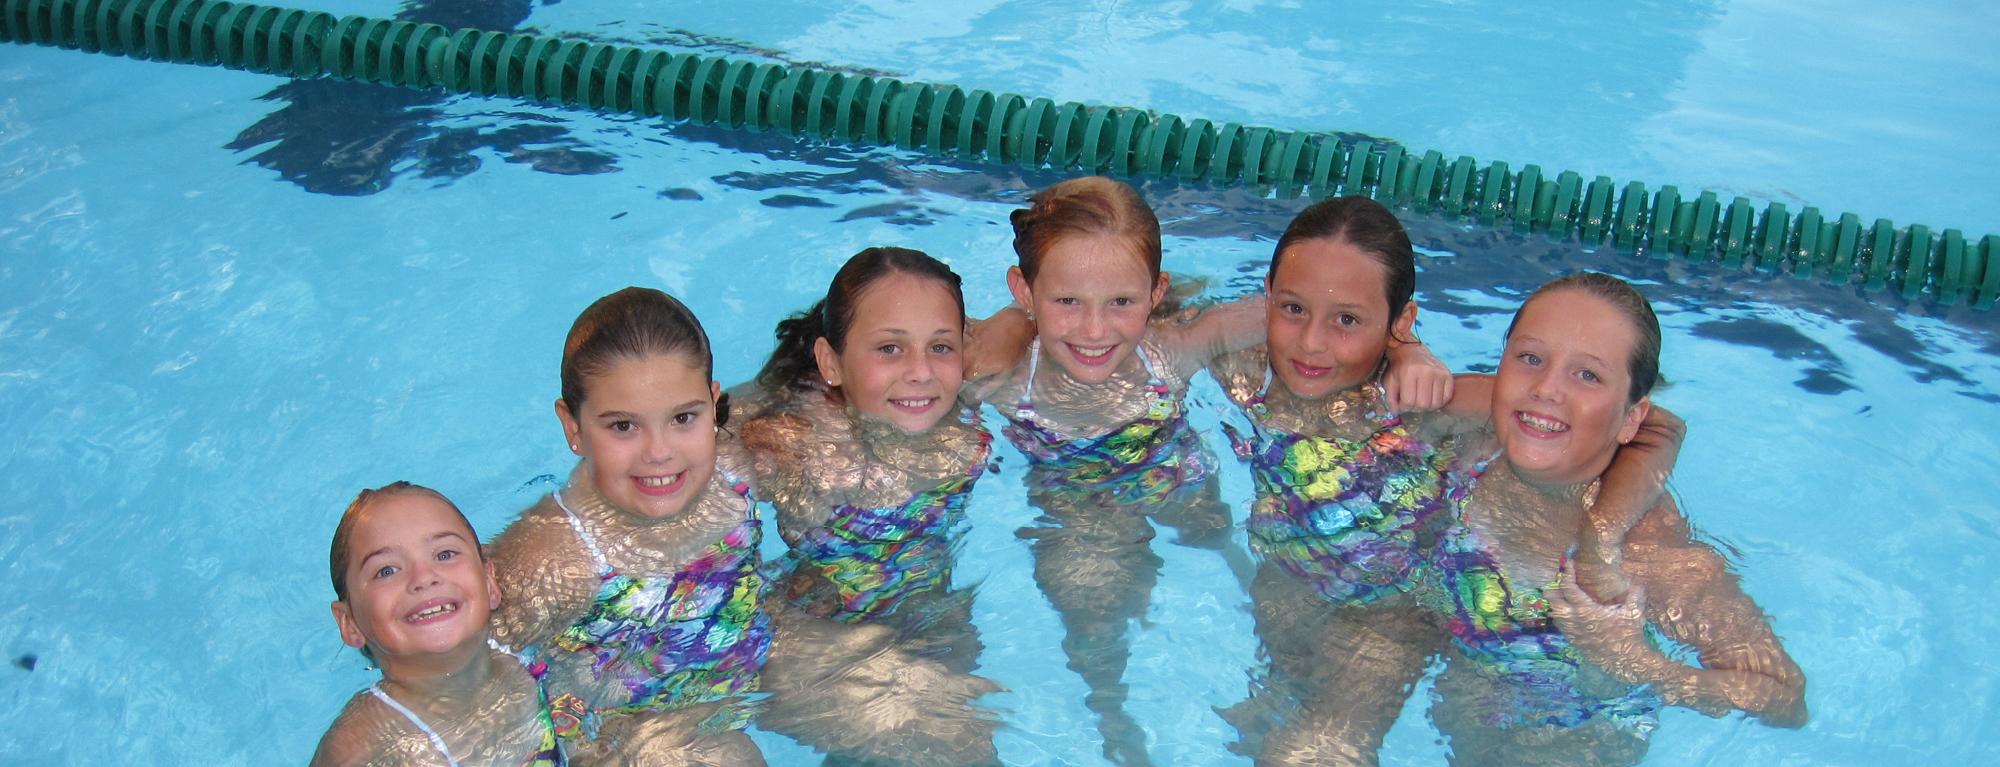 b6404faeb1 The Medallion Club: Swim Team